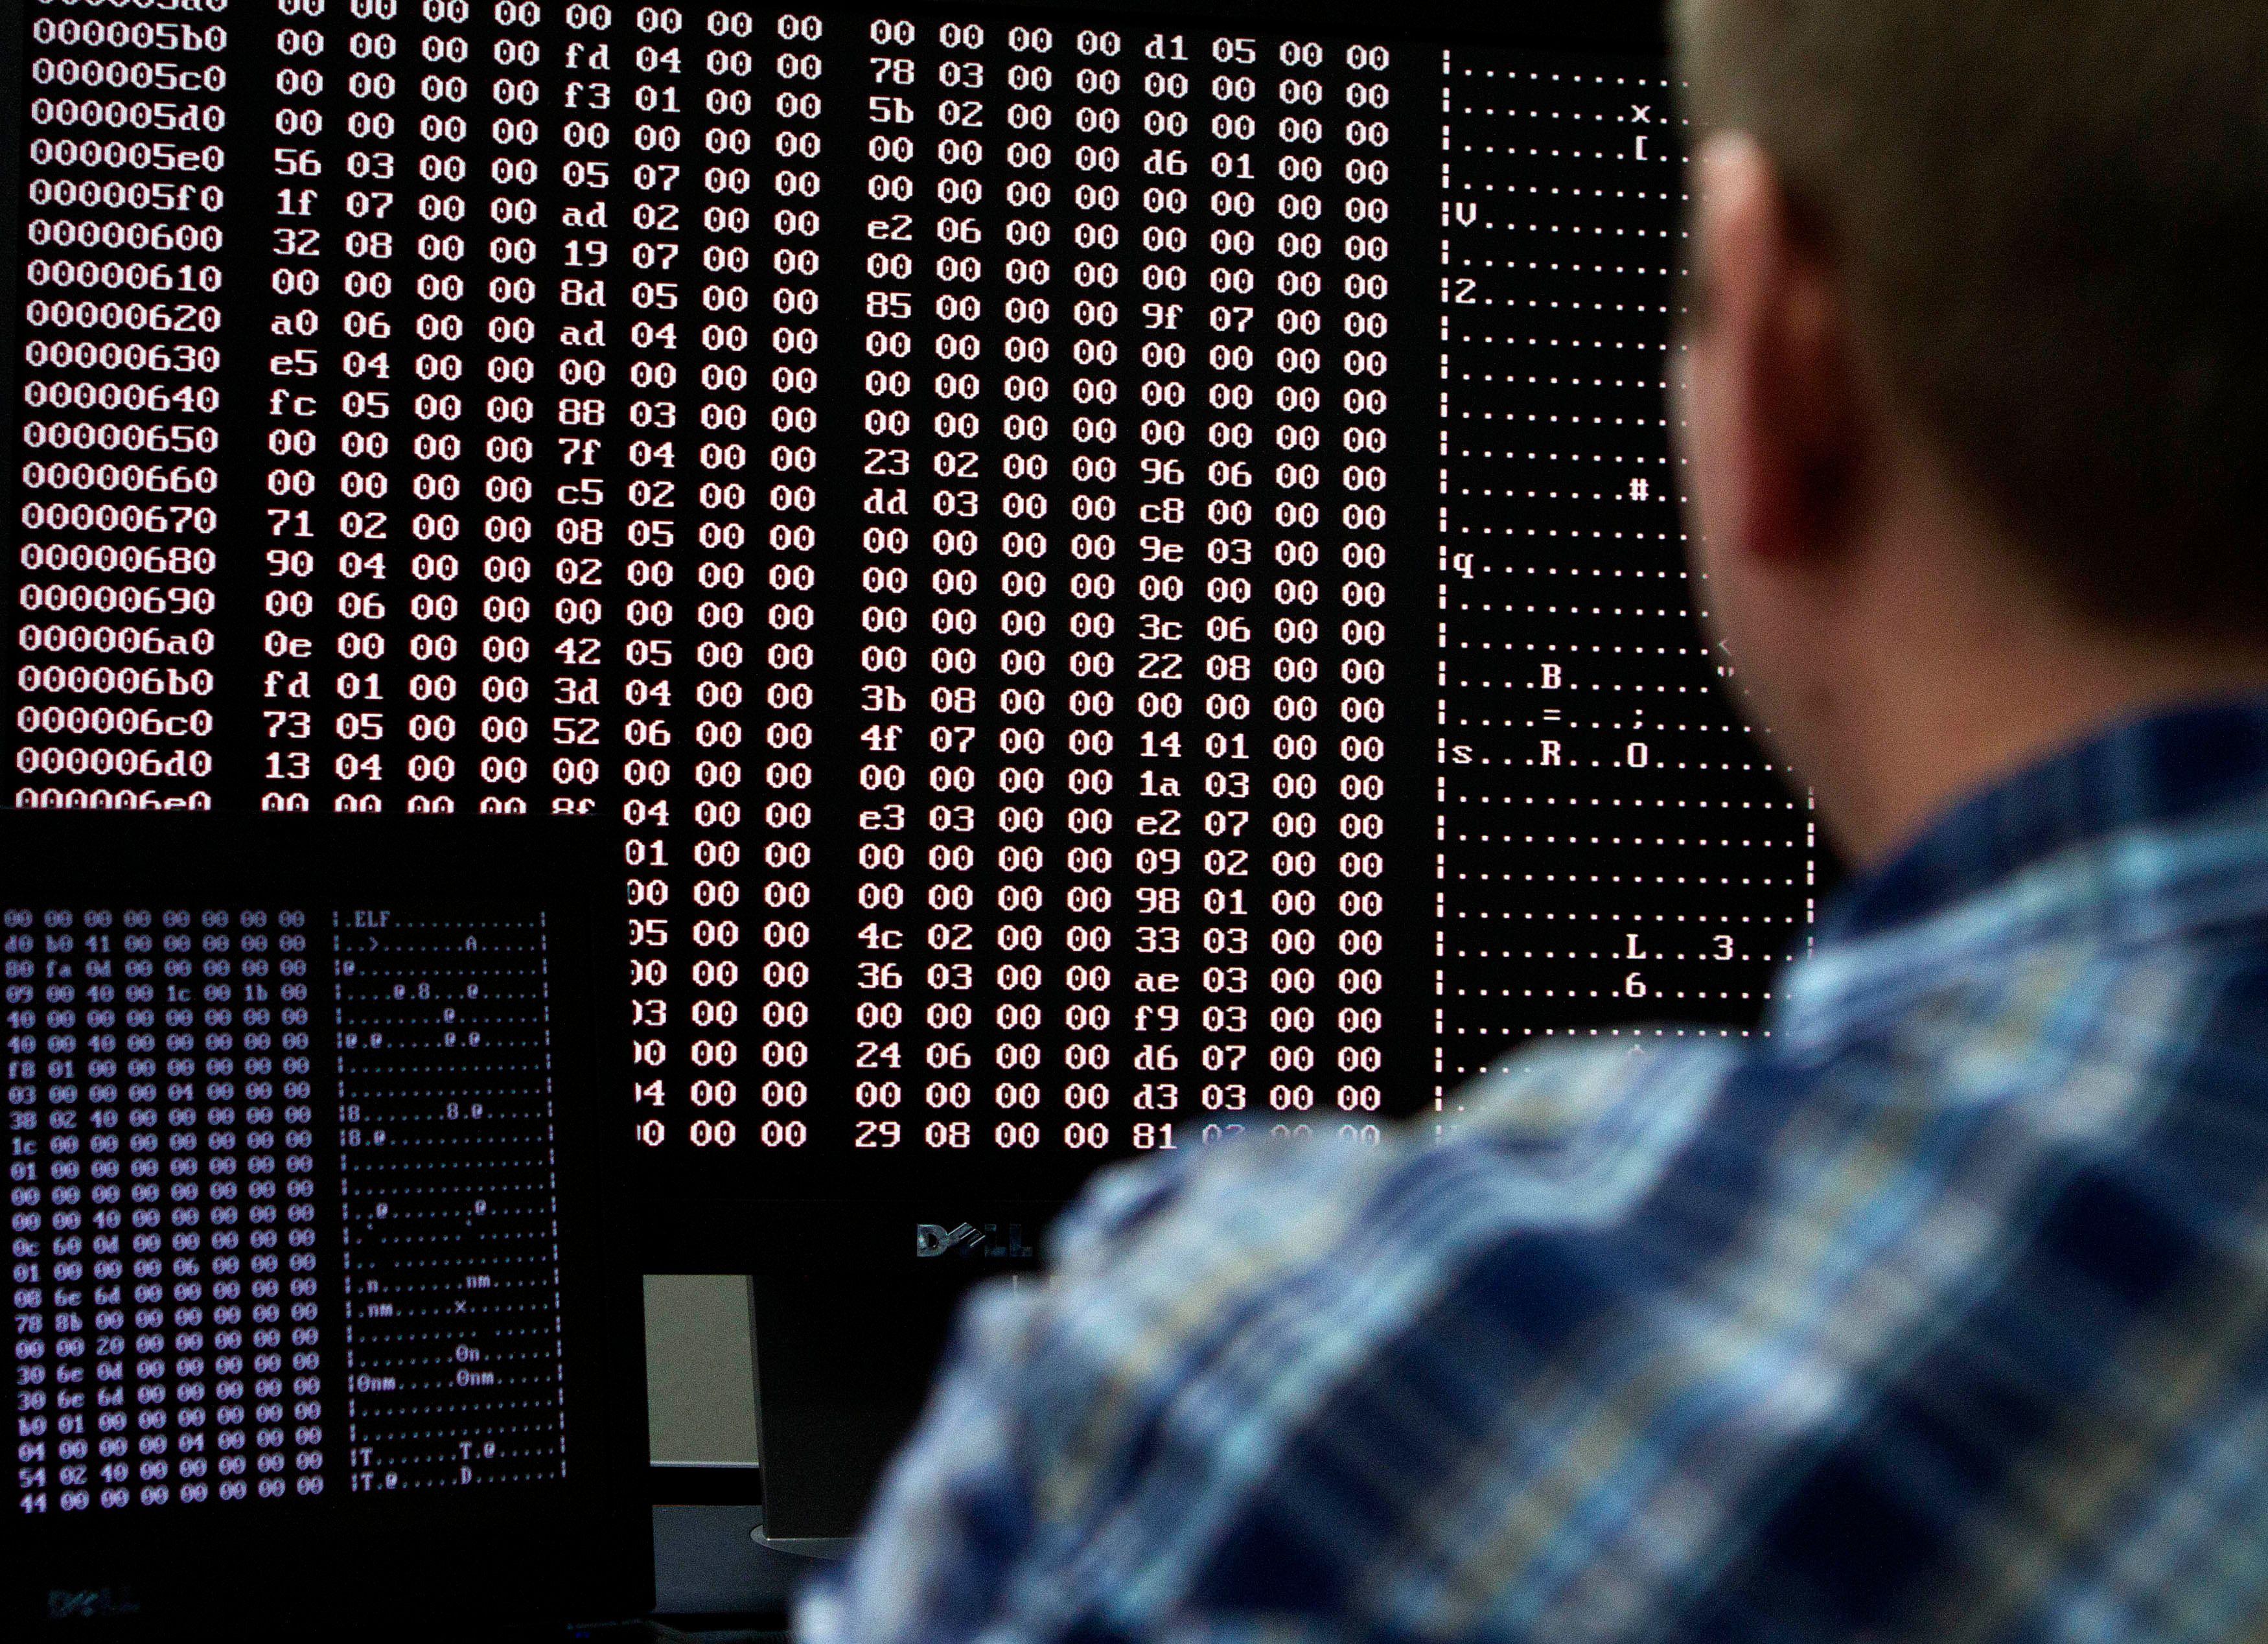 Cybersécurité : la France prend des mesures contre les cyberattaques